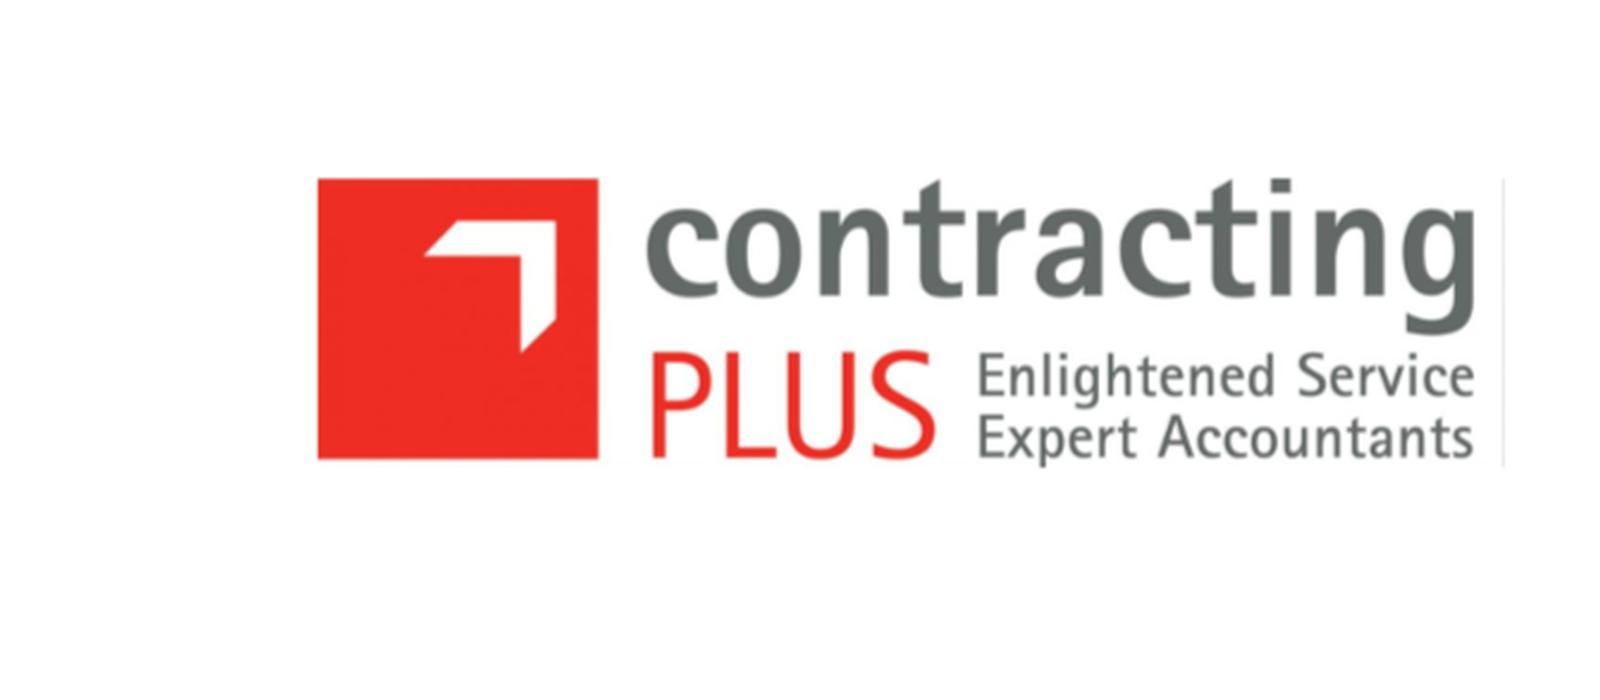 careers in Contracting PLUS